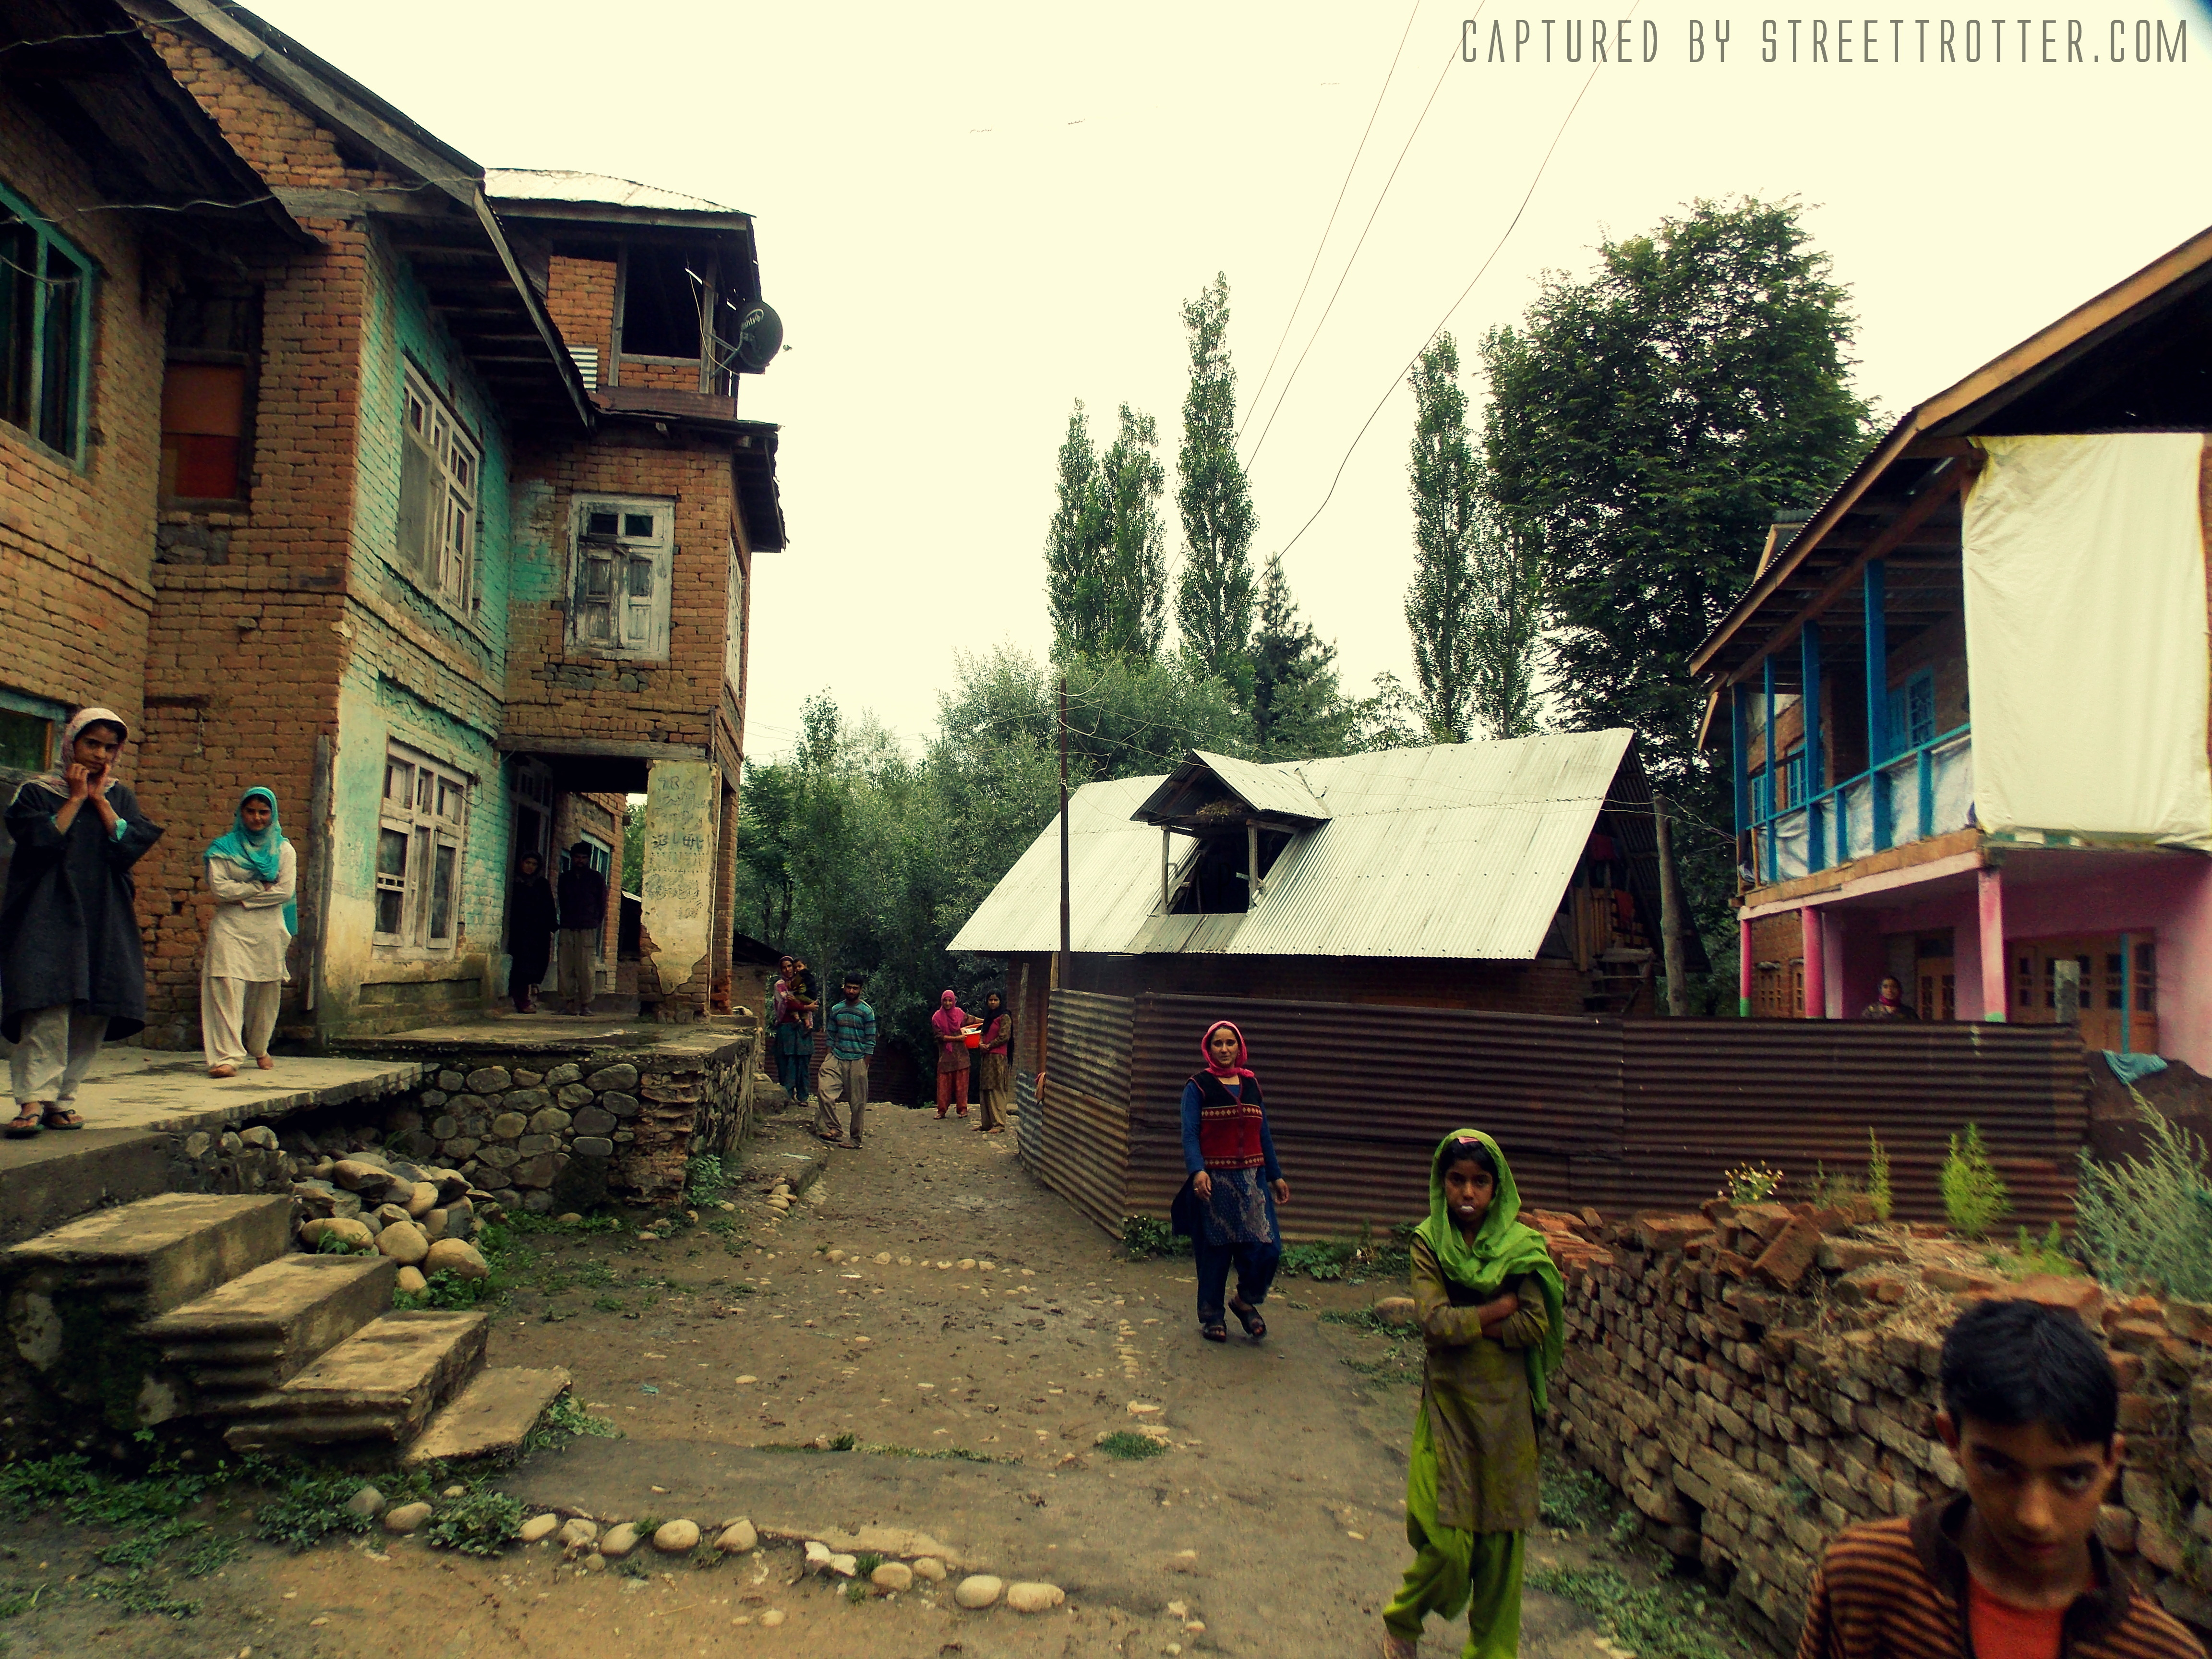 street of kashmir, srinagar